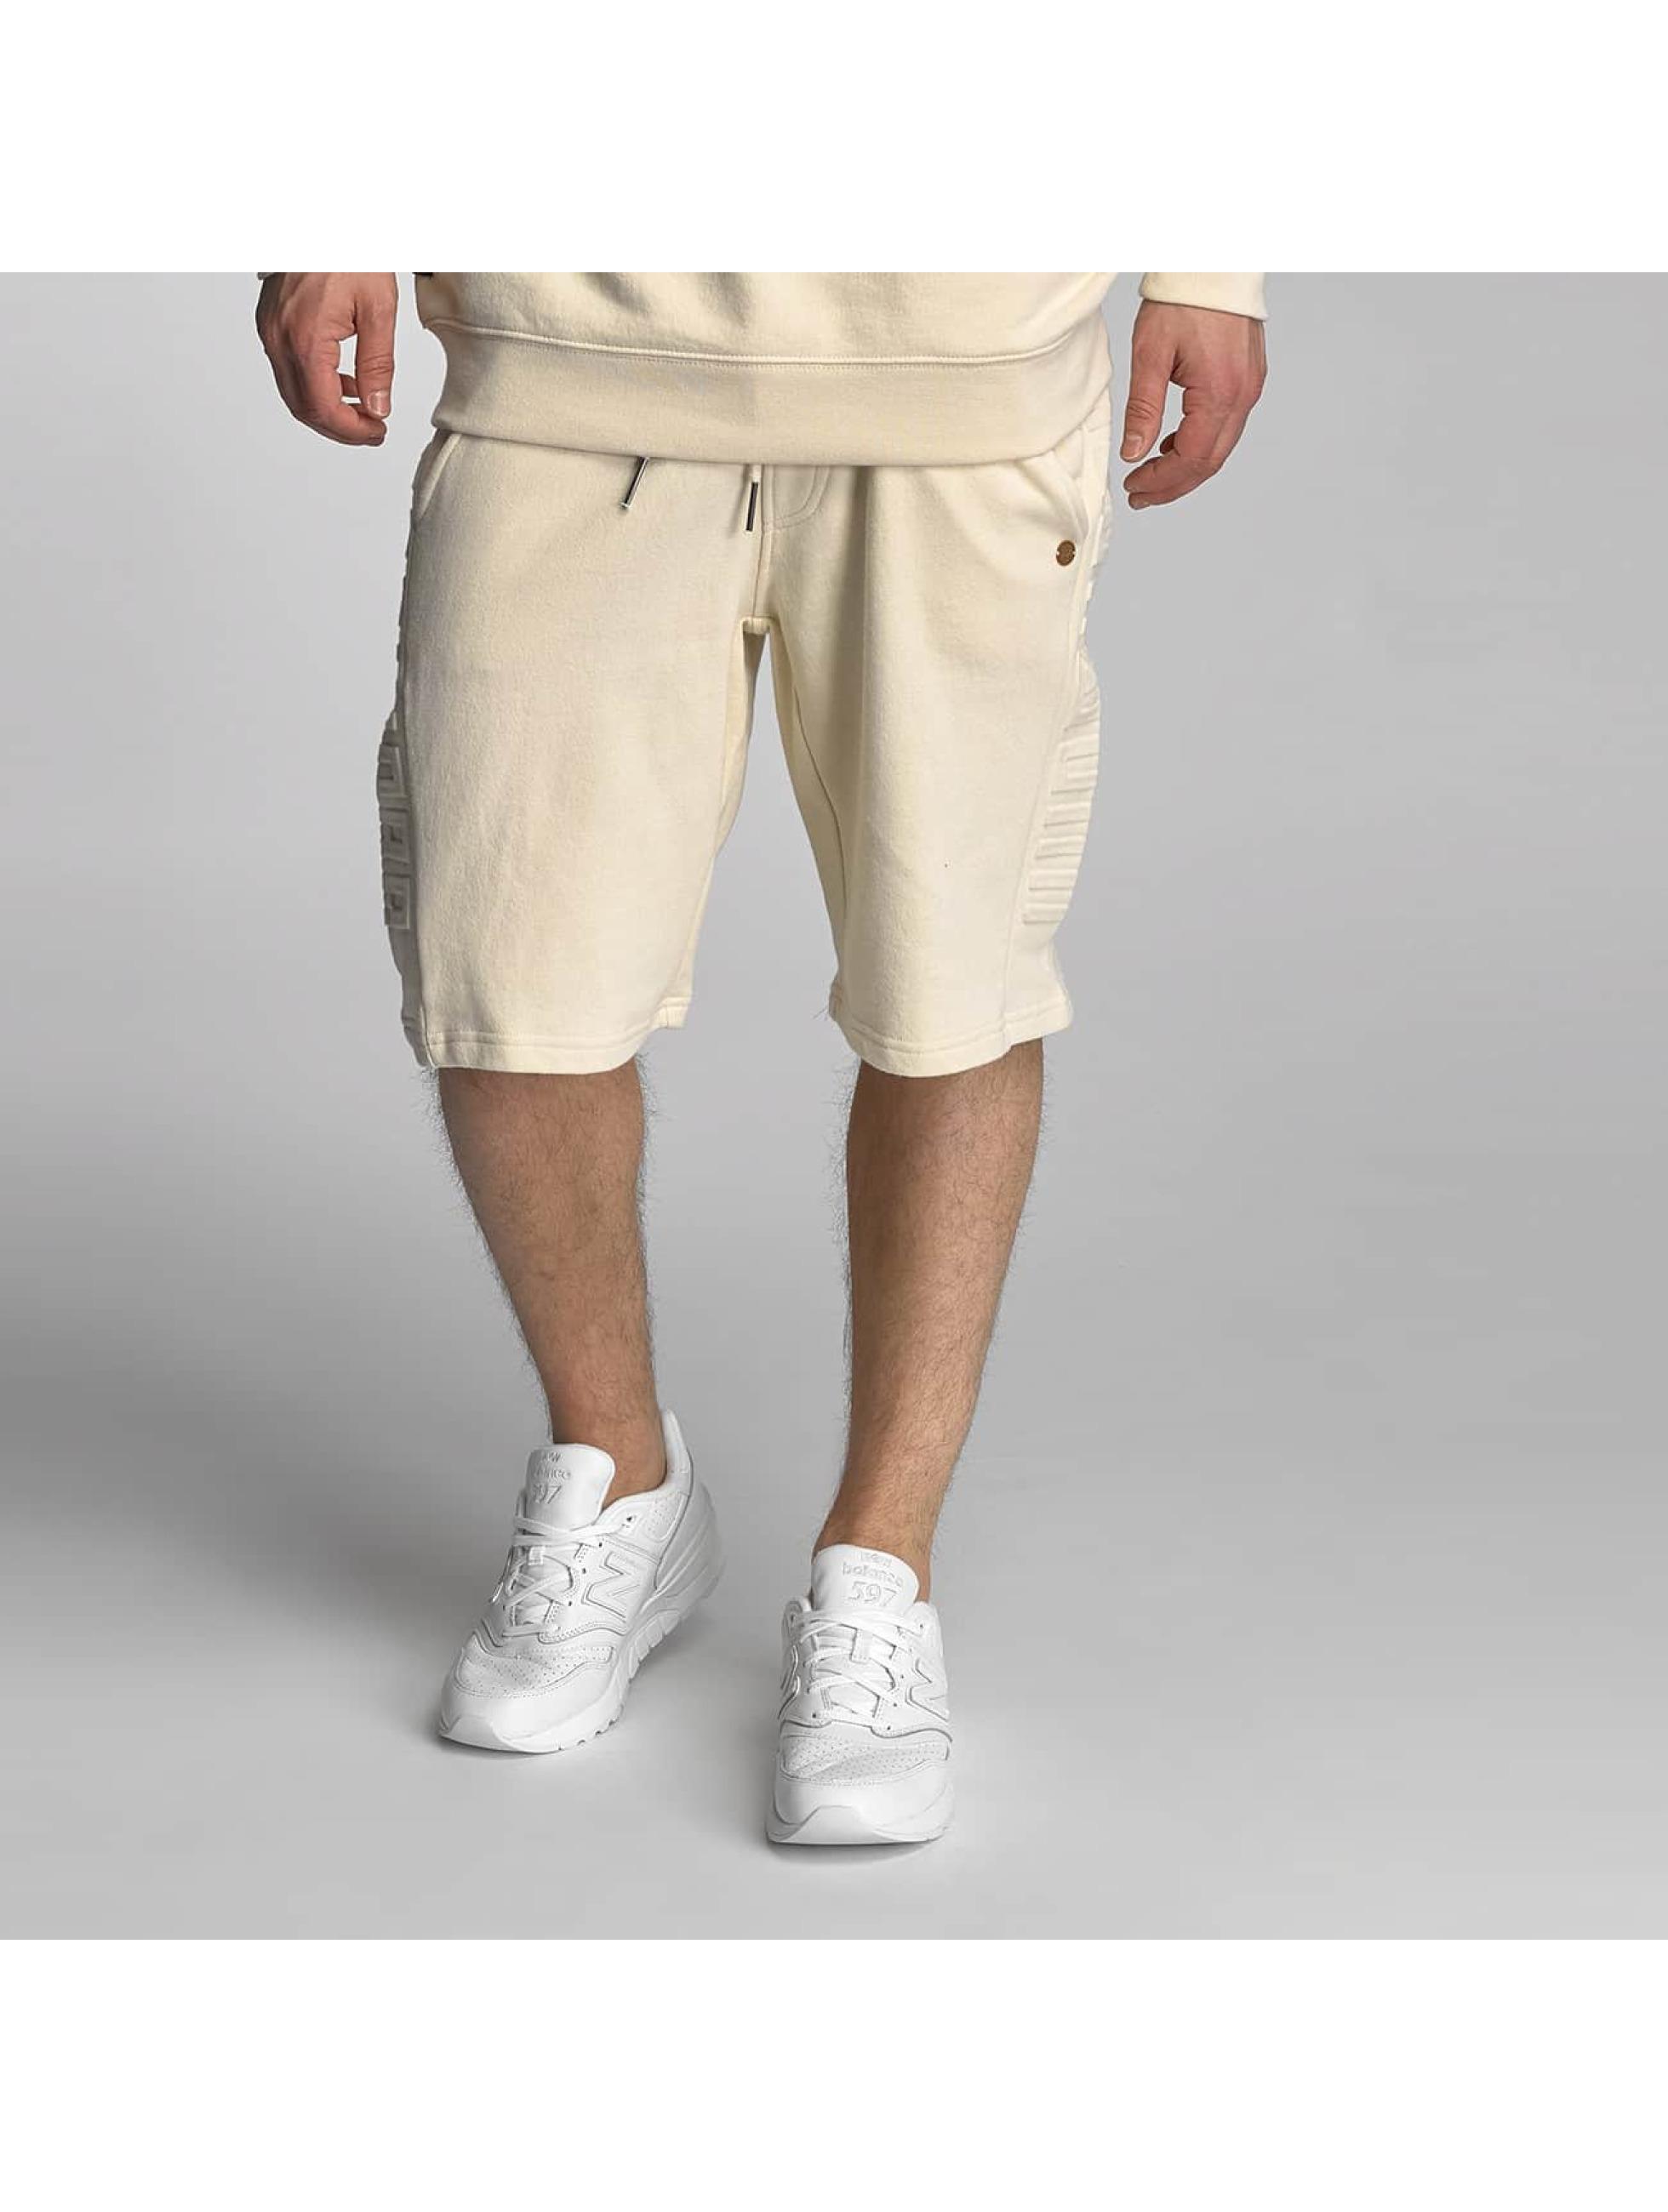 Rocawear Männer Shorts Arona in beige